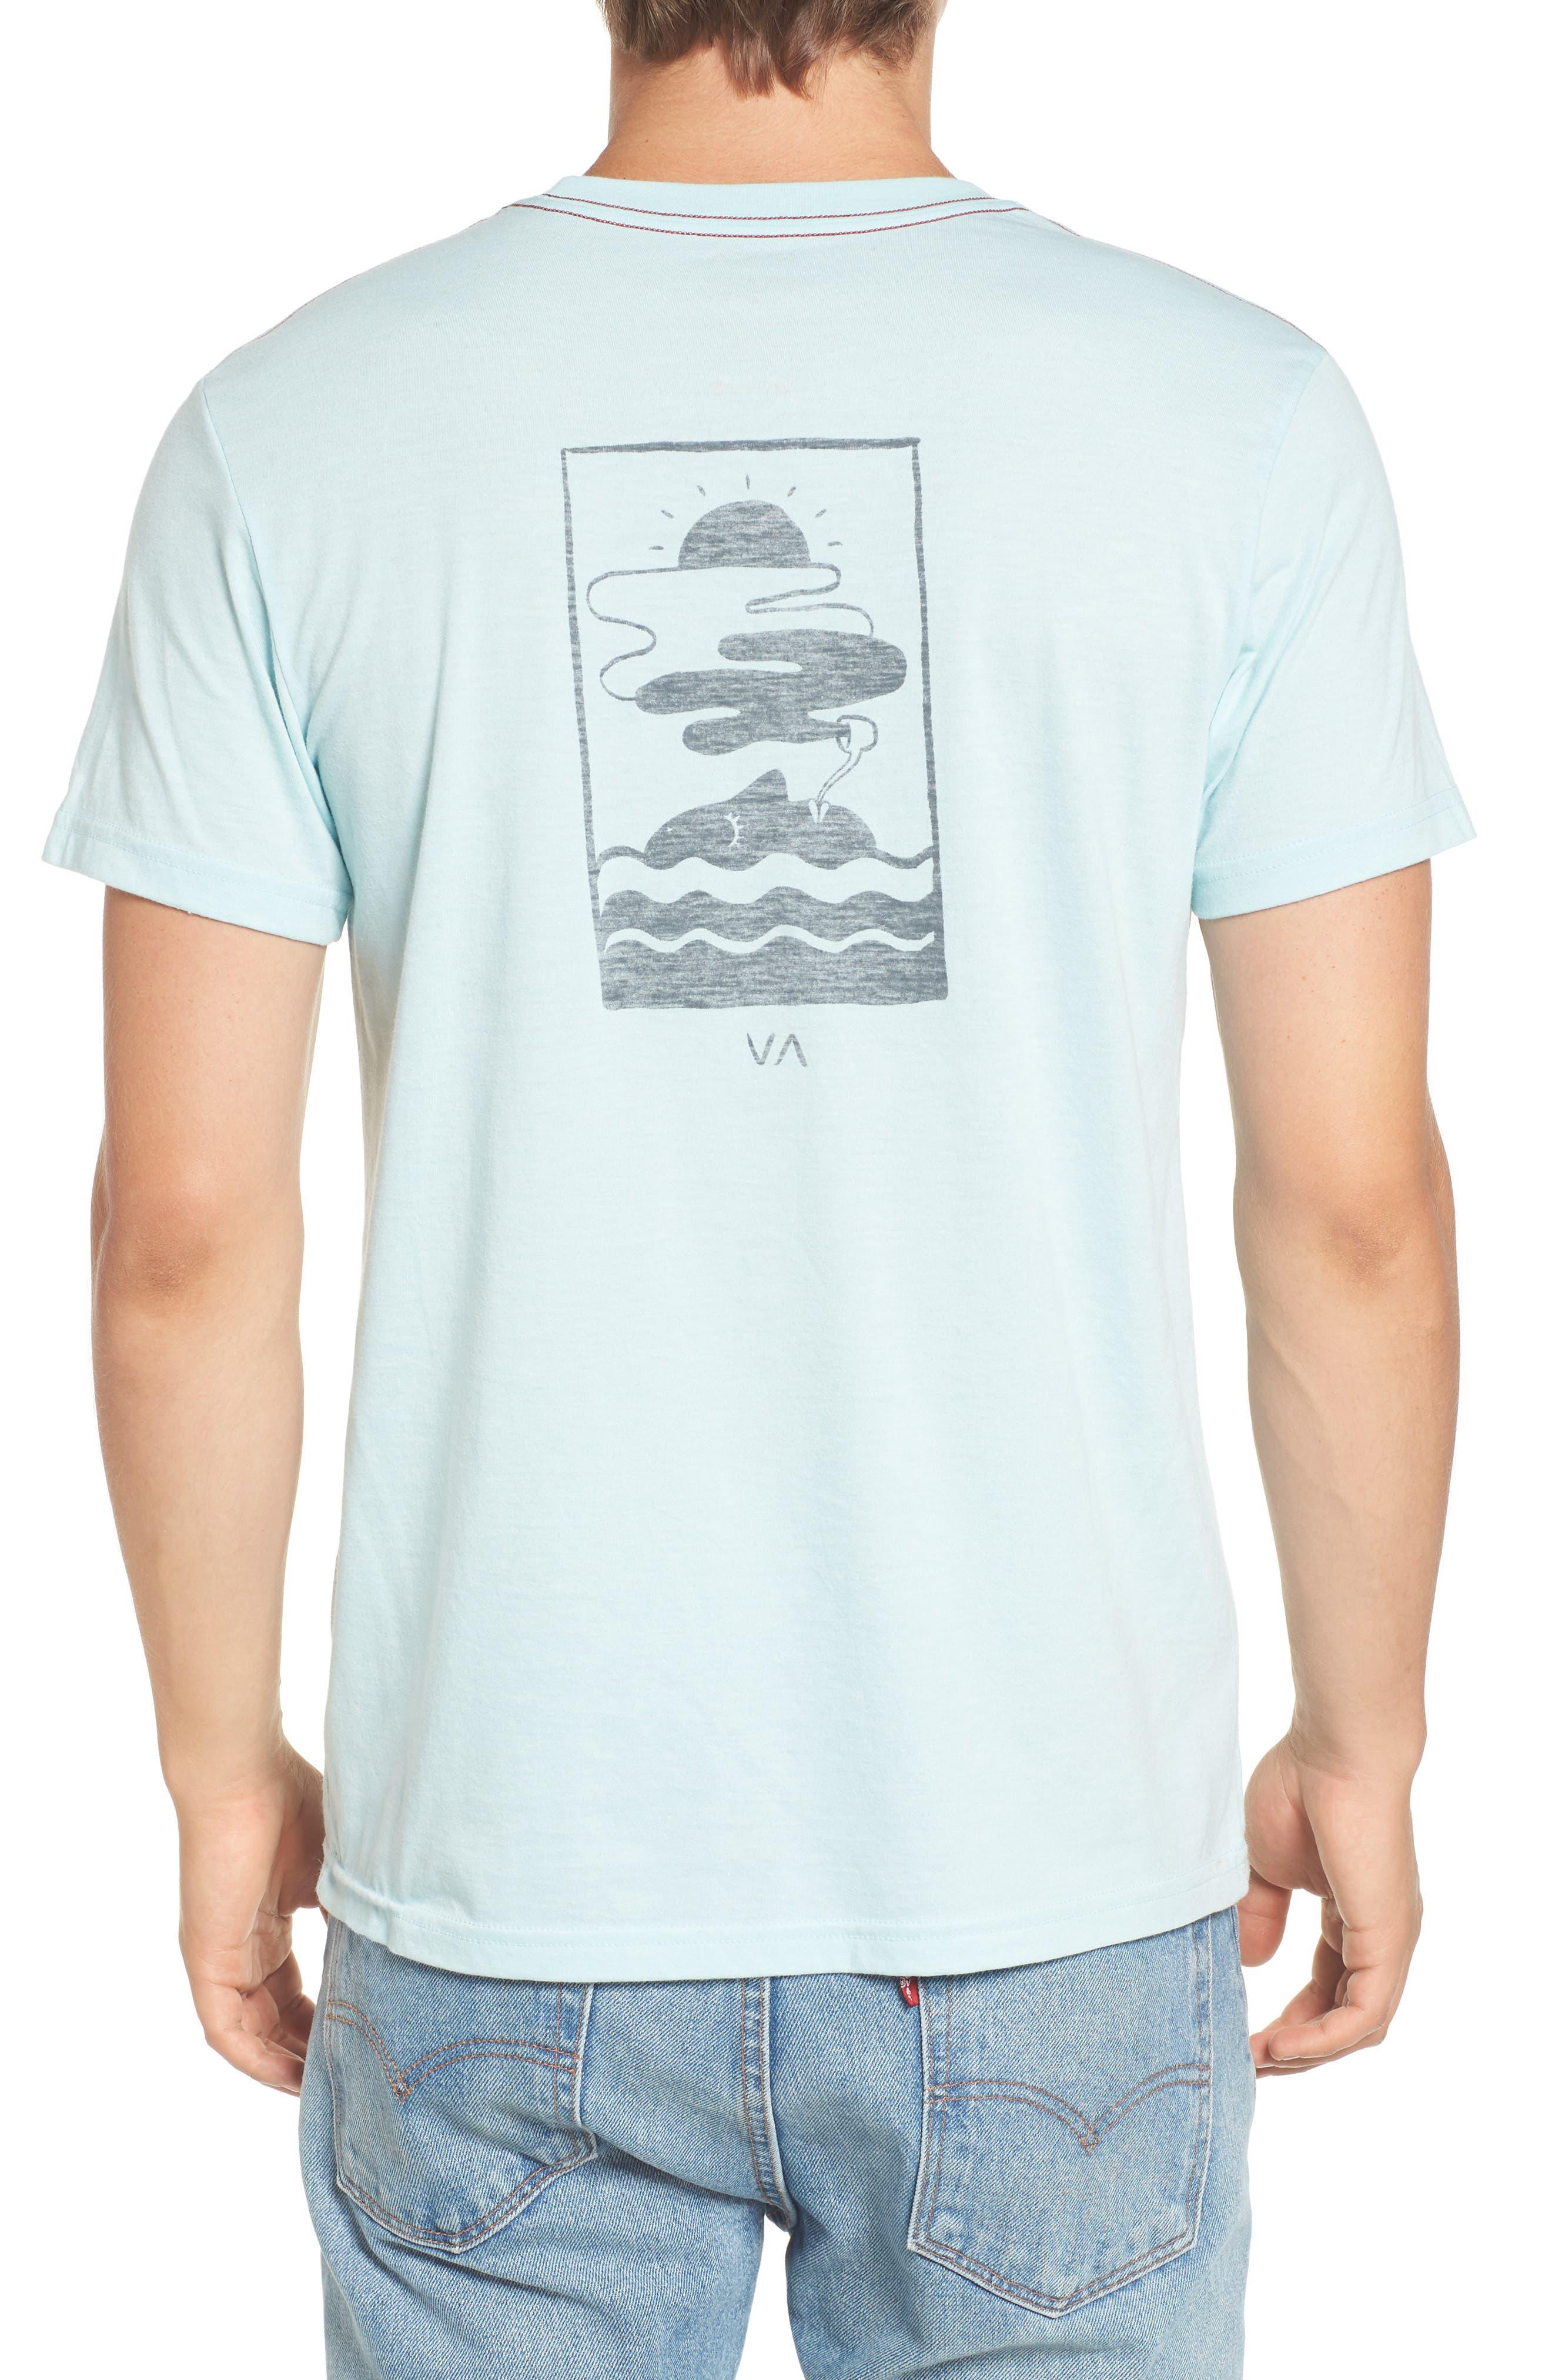 Snooze Cloud Graphic T-Shirt,                             Alternate thumbnail 4, color,